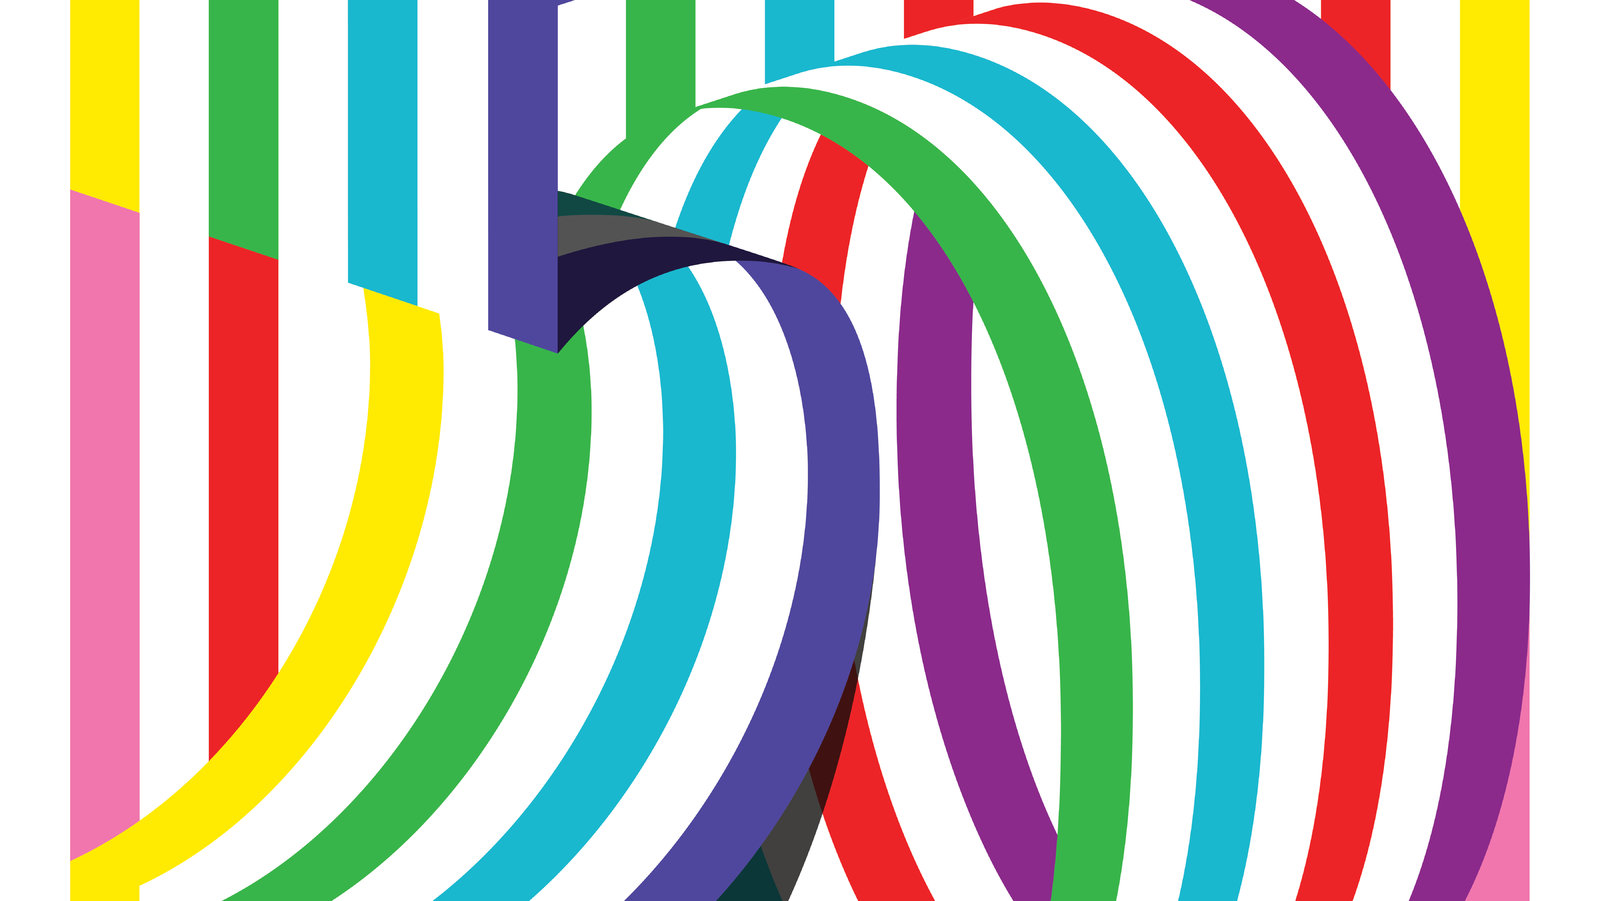 23sp-pride-web-logo-videoSixteenByNineJumbo1600-v3.jpg